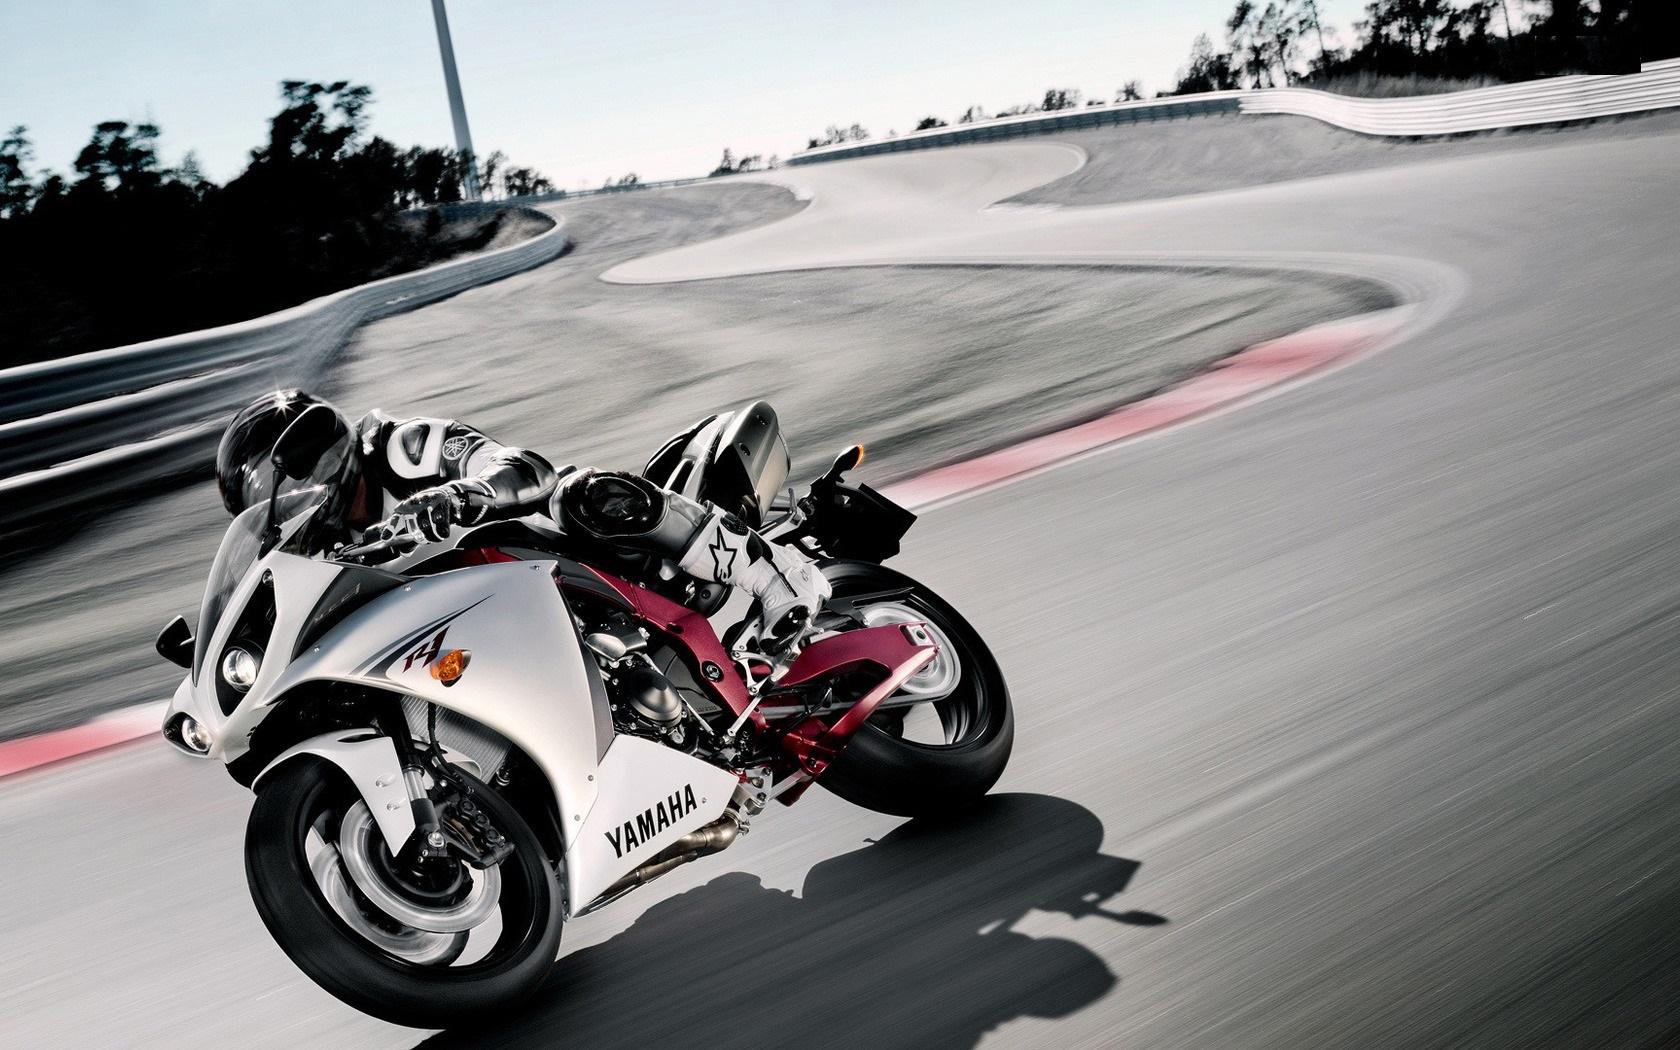 Yamaha Tesseract Bikes Picture & Wallpaper